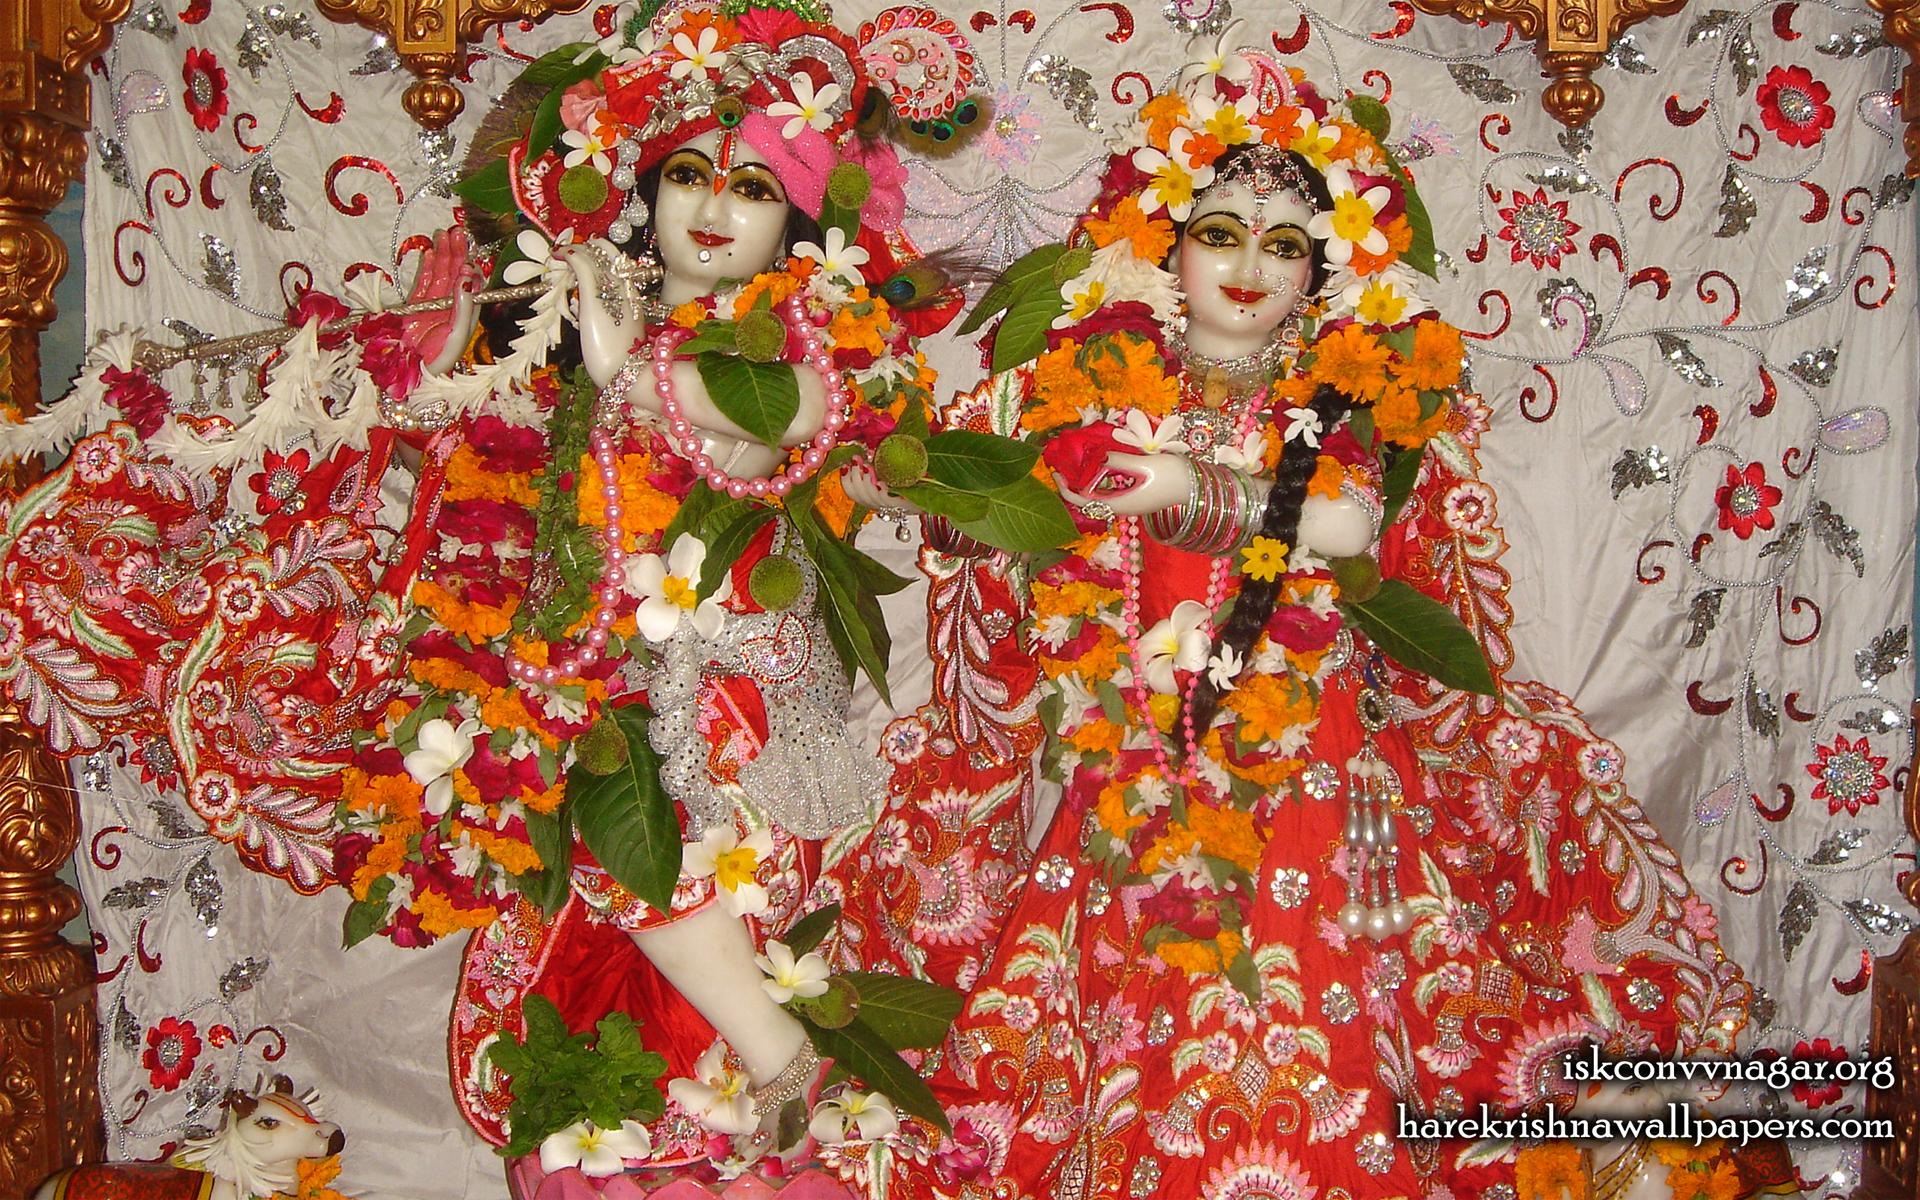 Sri Sri Radha Giridhari Wallpaper (031) Size 1920x1200 Download